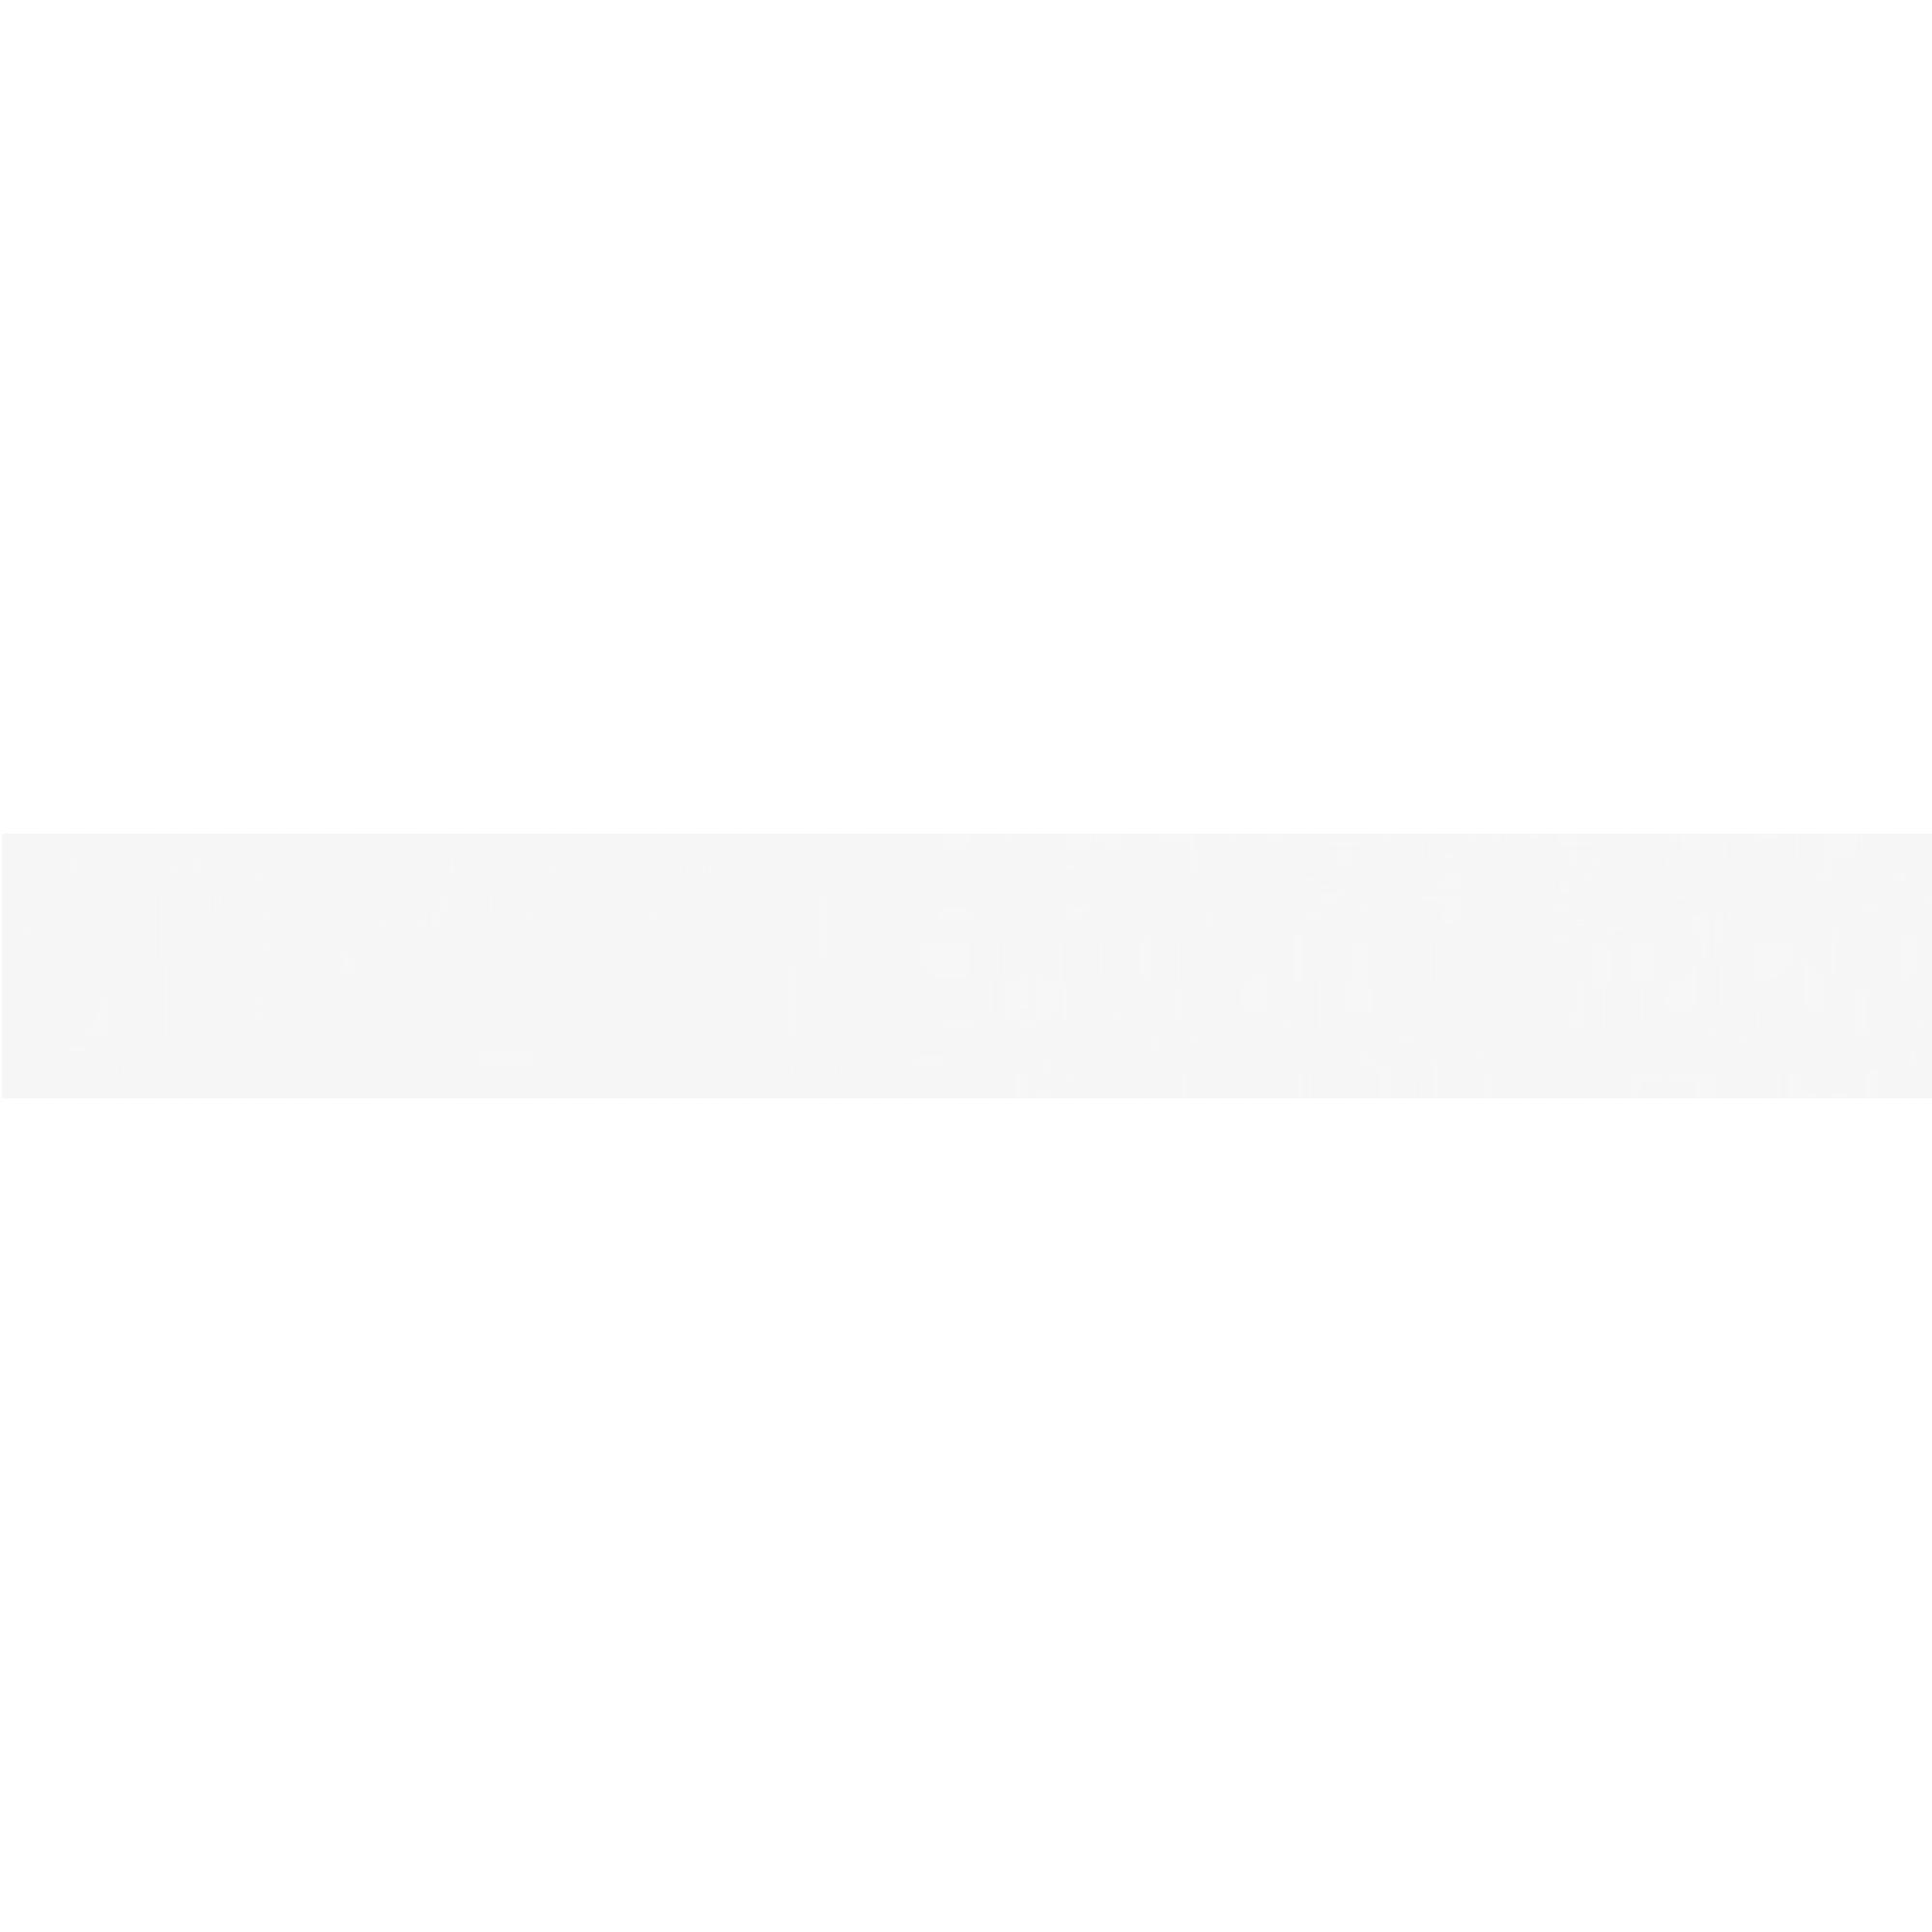 dac白底logo